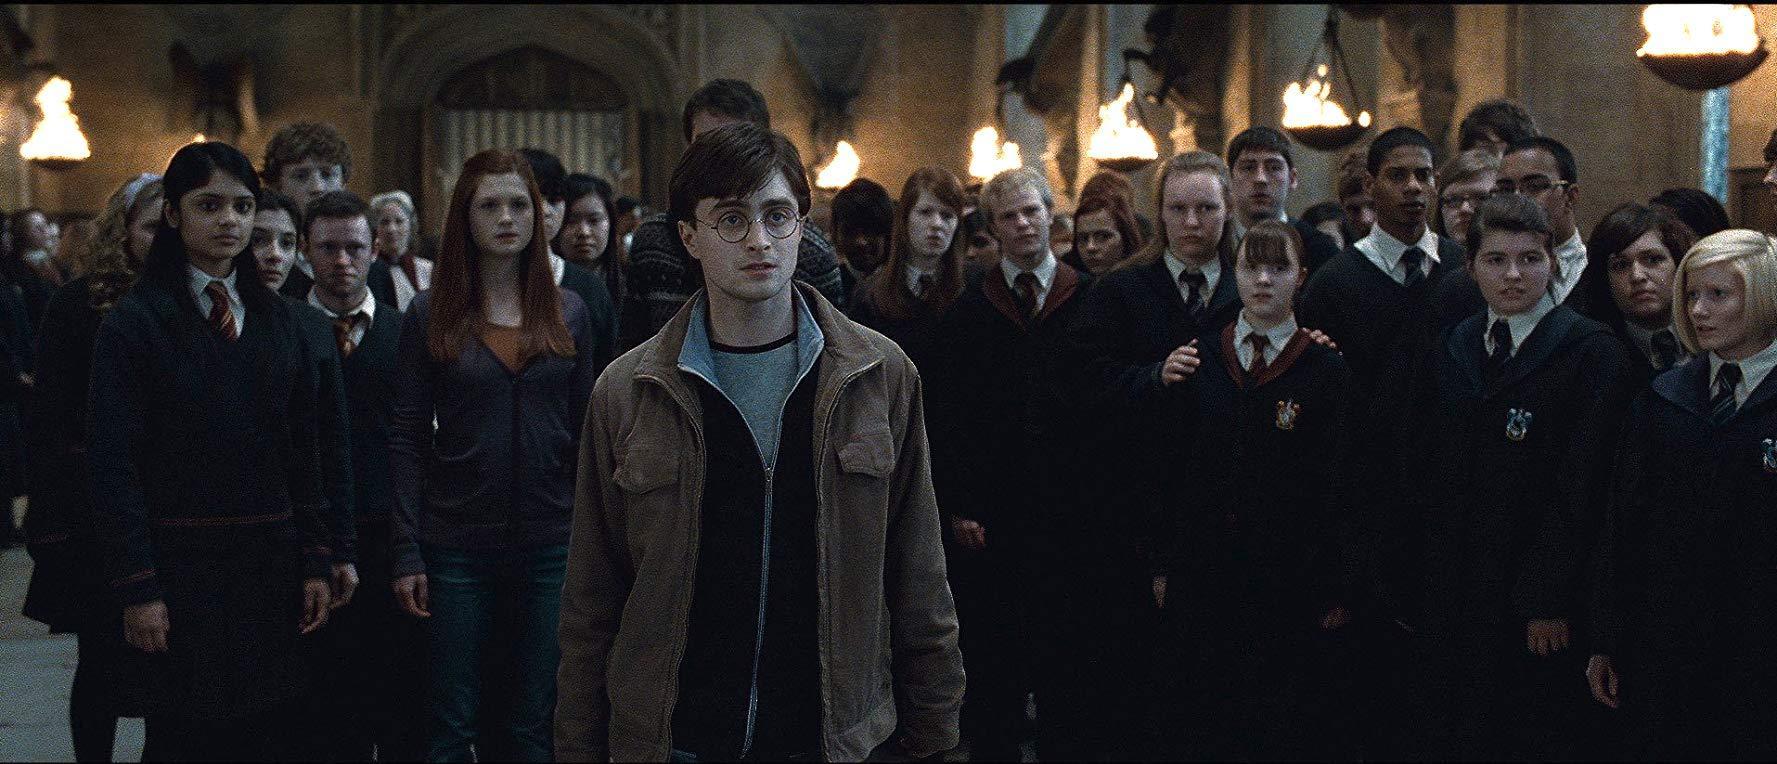 مشاهدة فيلم Harry Potter And The Deathly Hallows Part 2 2011 HD مترجم كامل اون لاين